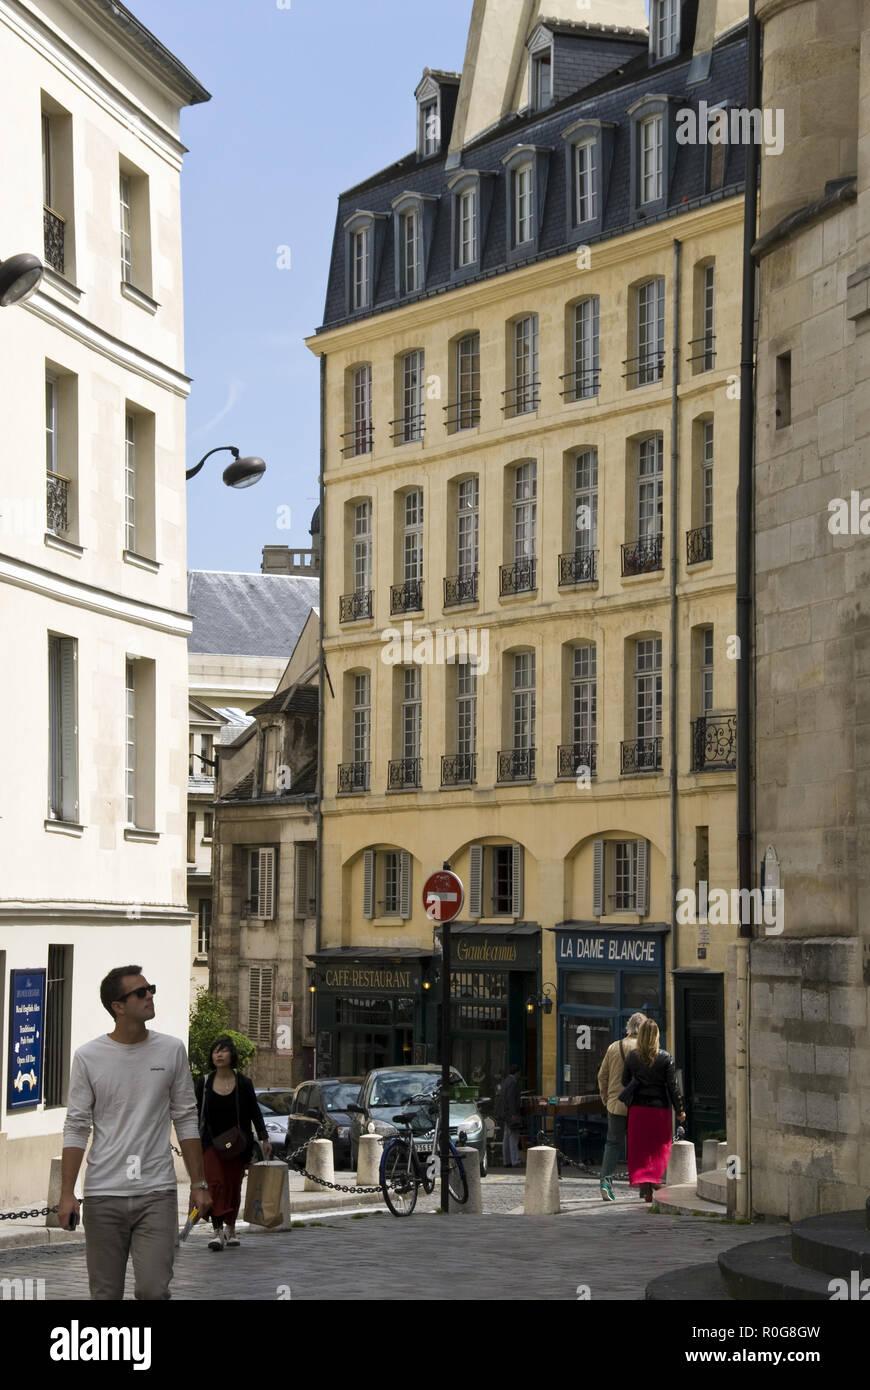 "Rue de la Montagne Sainte-Genevieve, a movie location for Woody Allen's film, 'Midnight in Paris,"" near the Pantheon, Latin Quarter, Paris. - Stock Image"